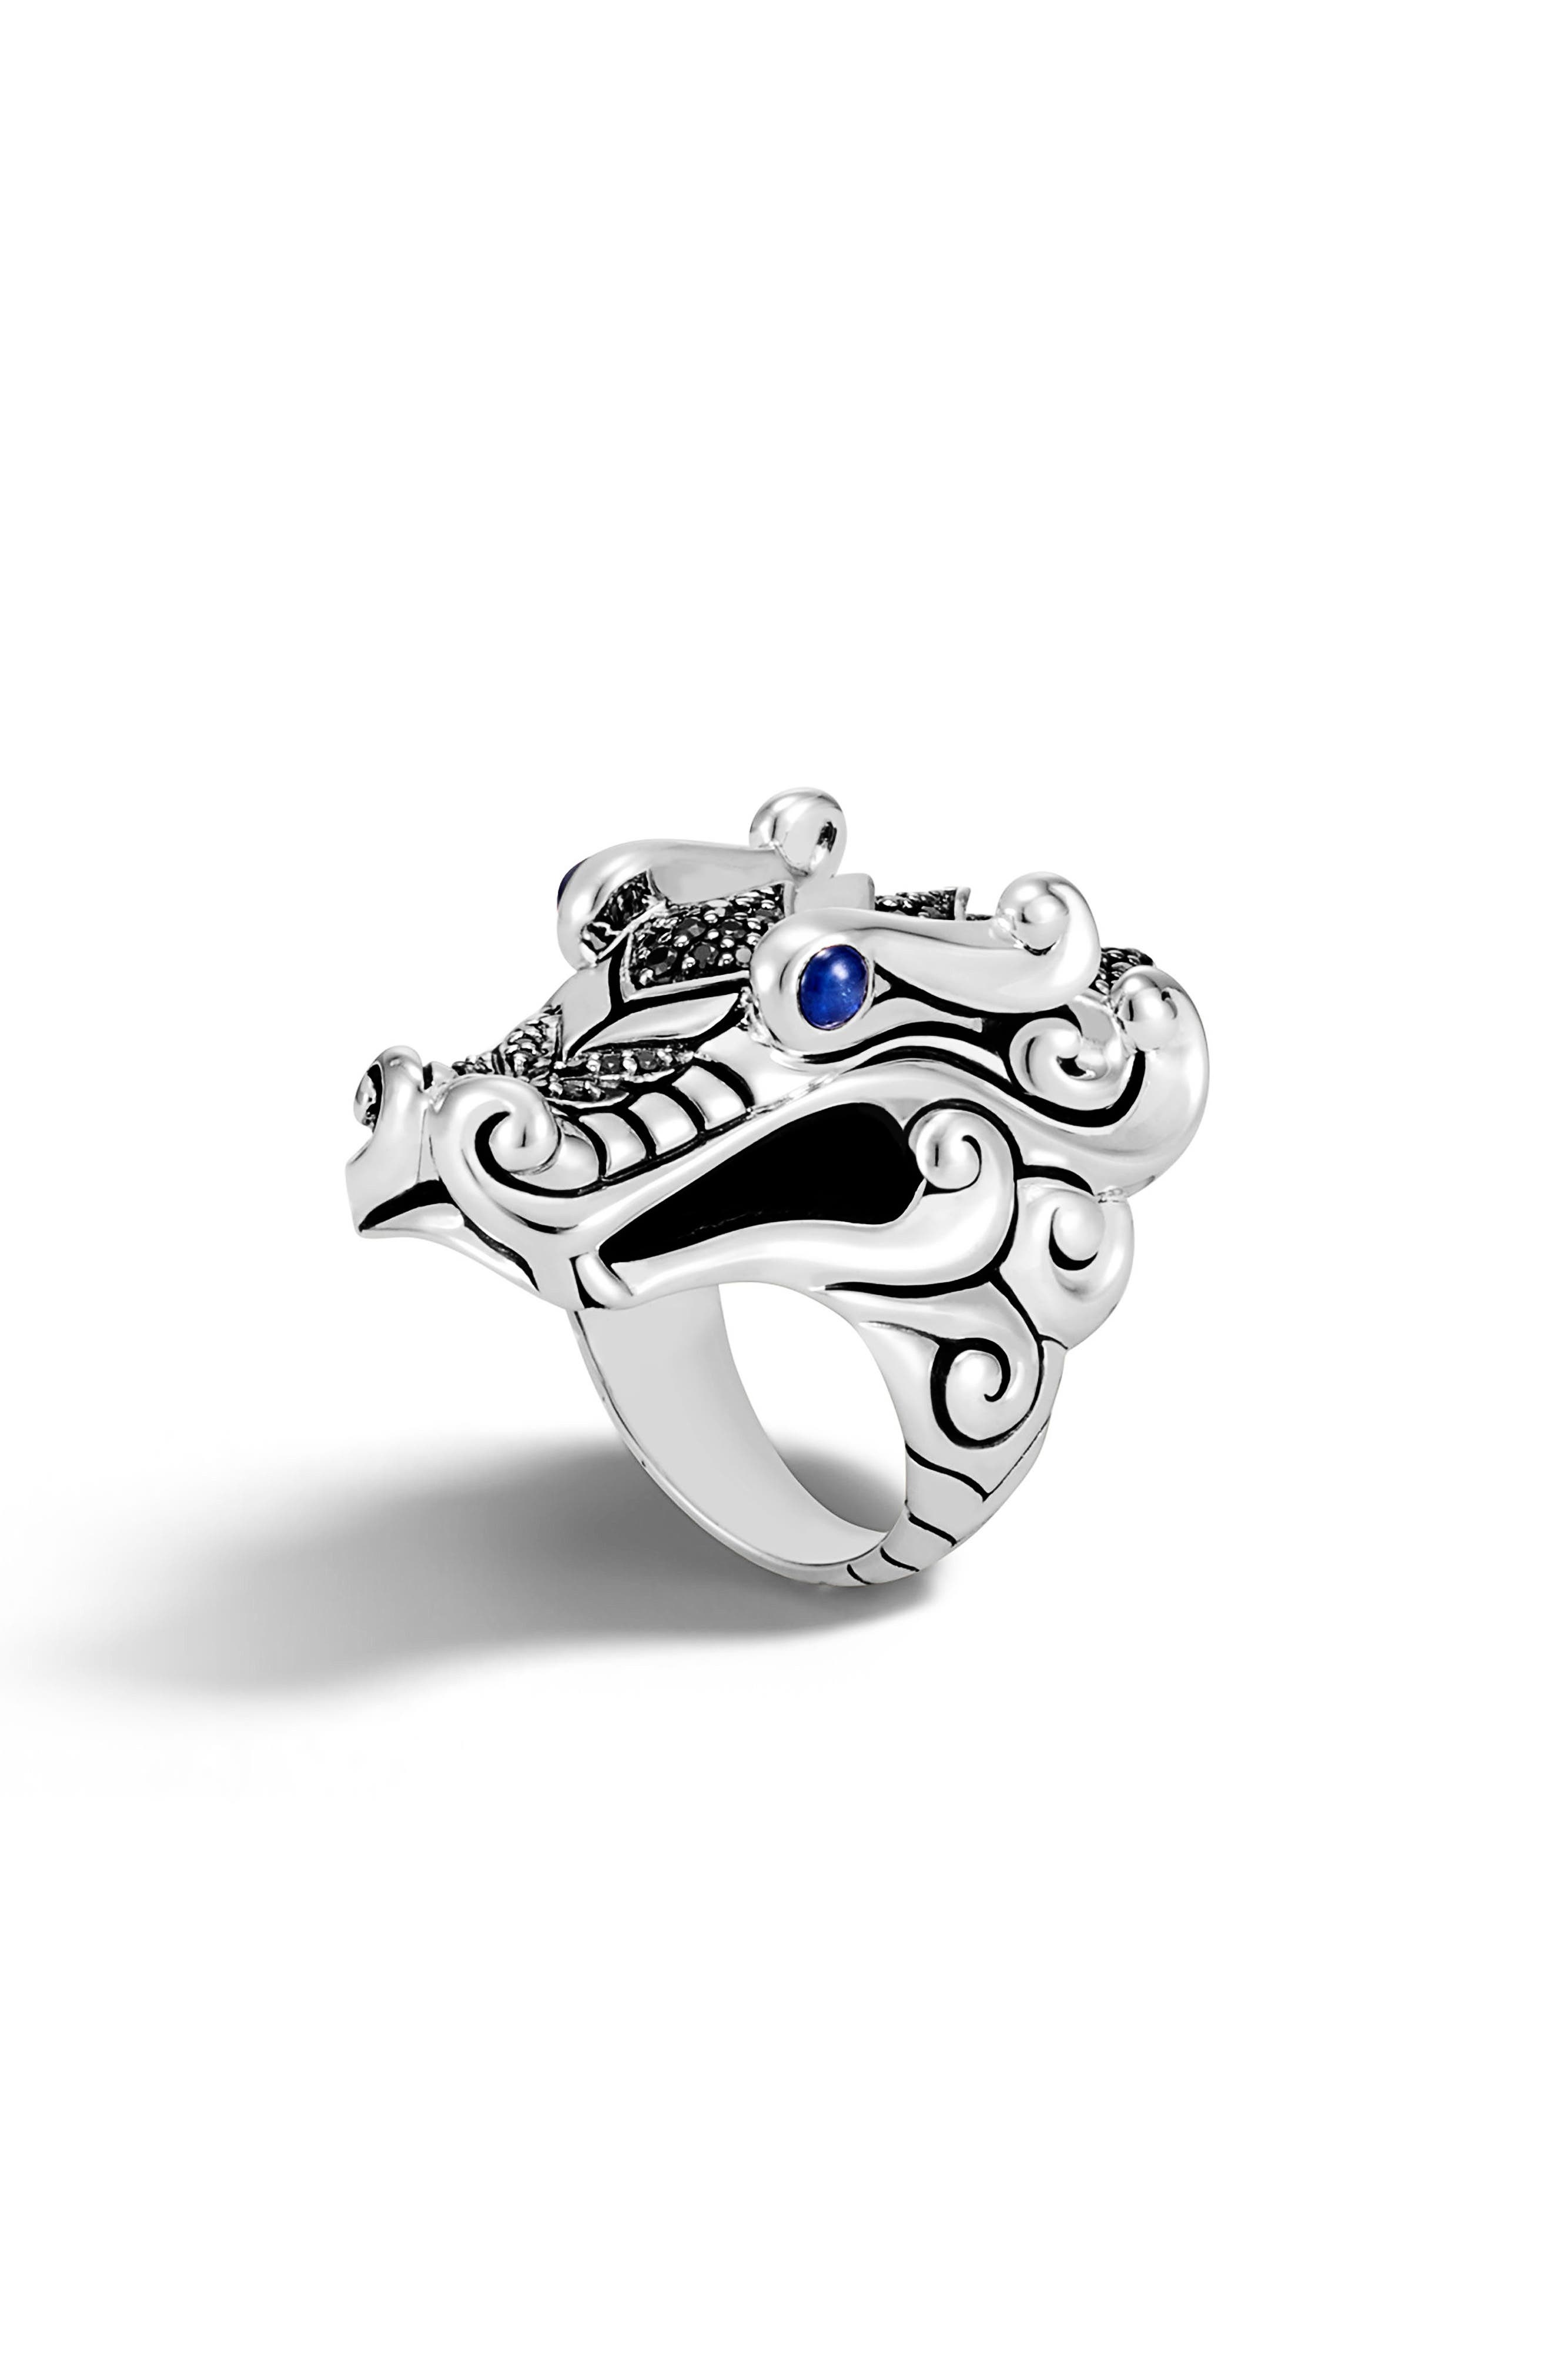 Legends Naga Ring,                         Main,                         color, Silver/ Black/ Blue Sapphire